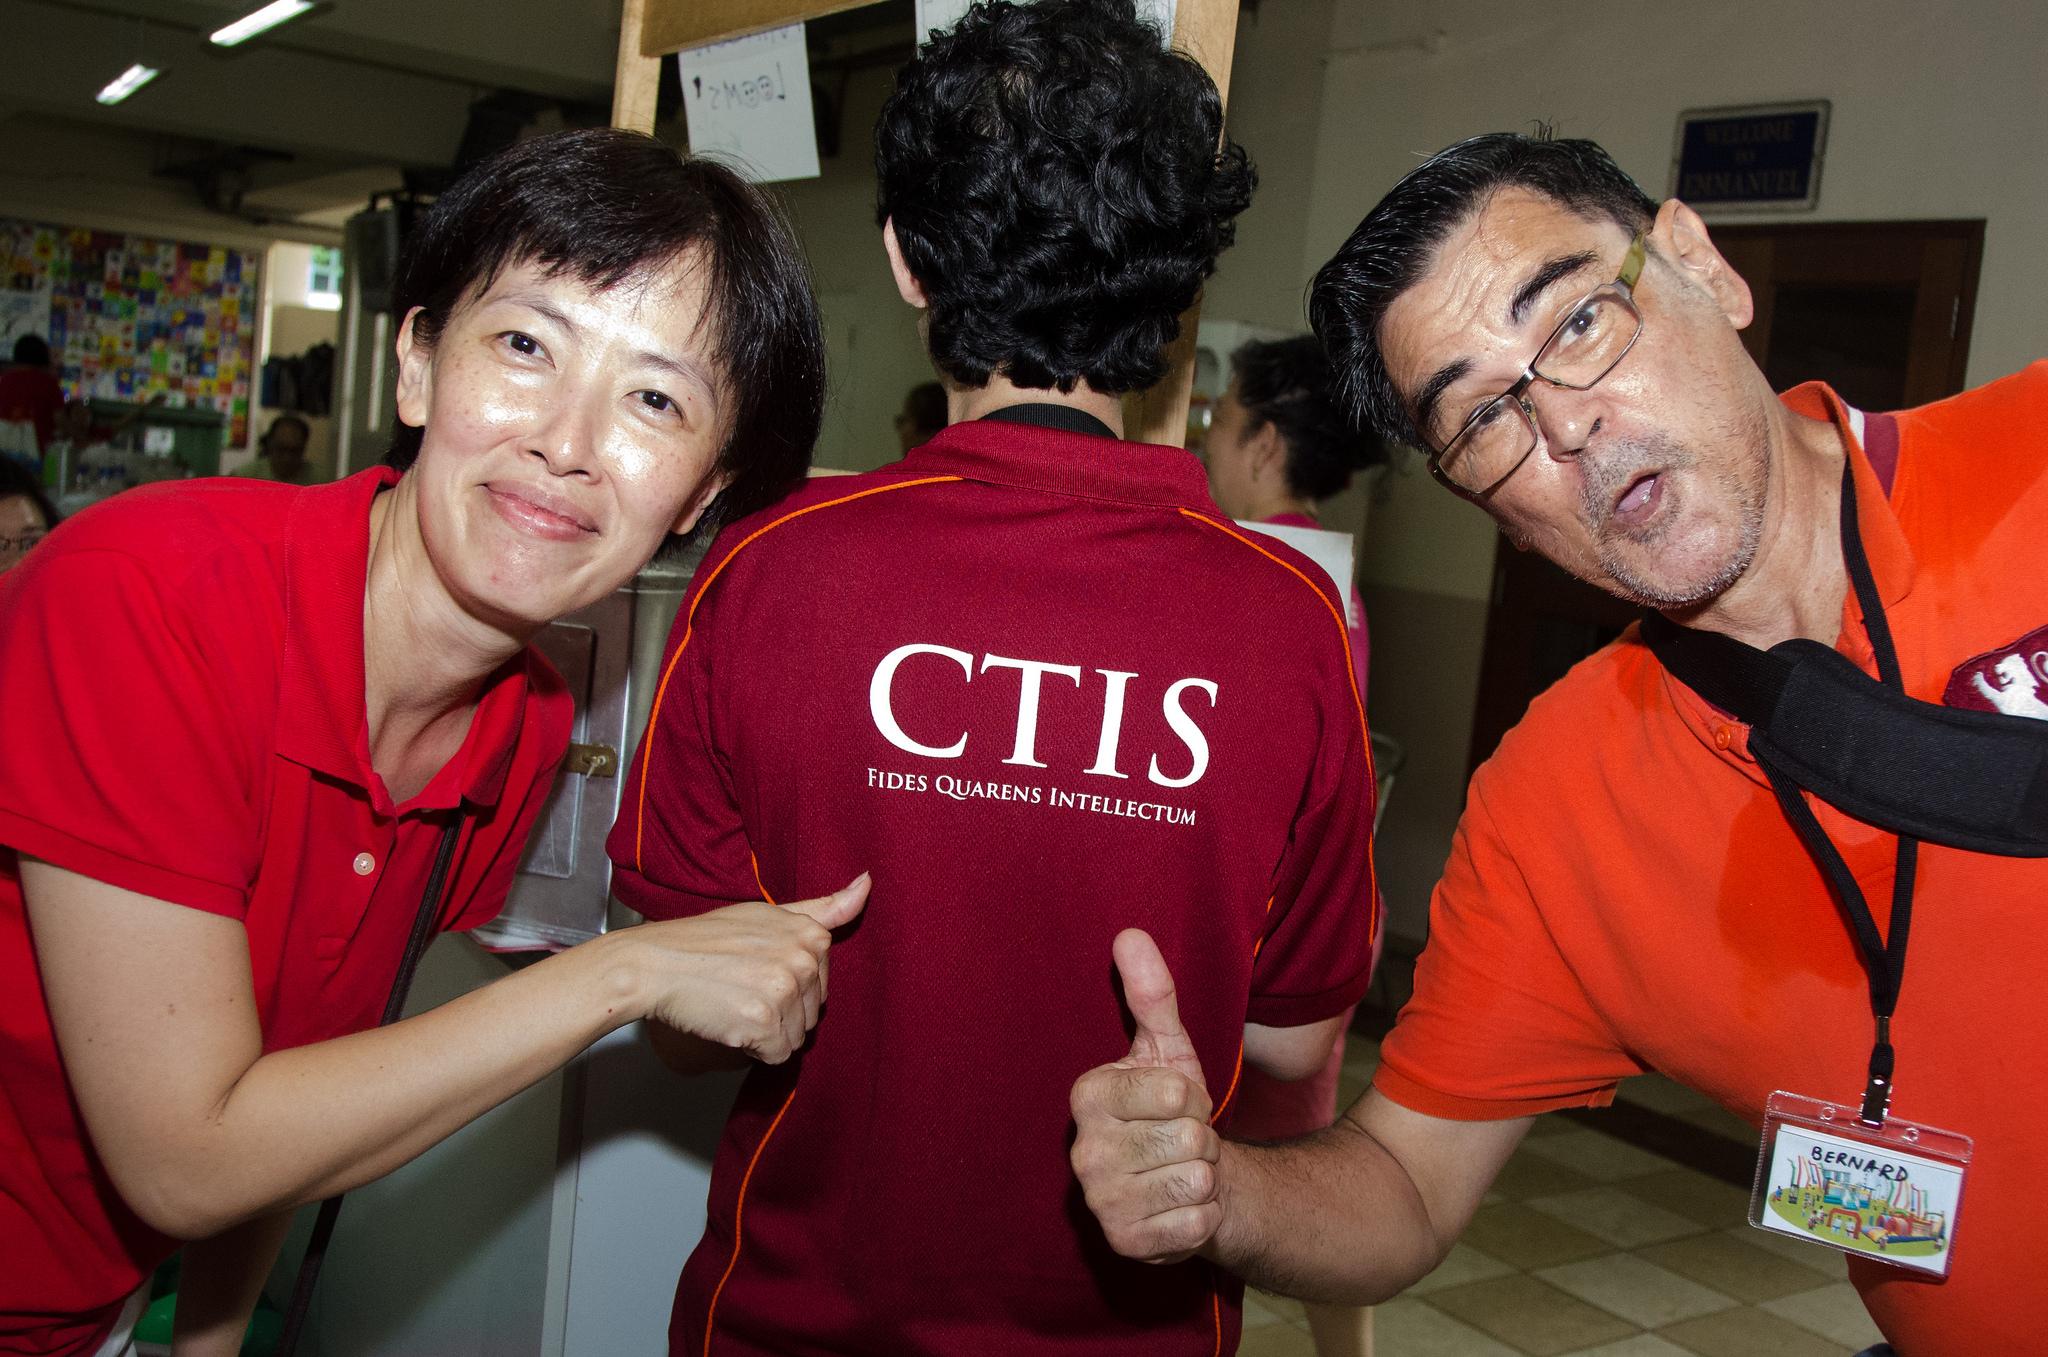 CTIS-tees